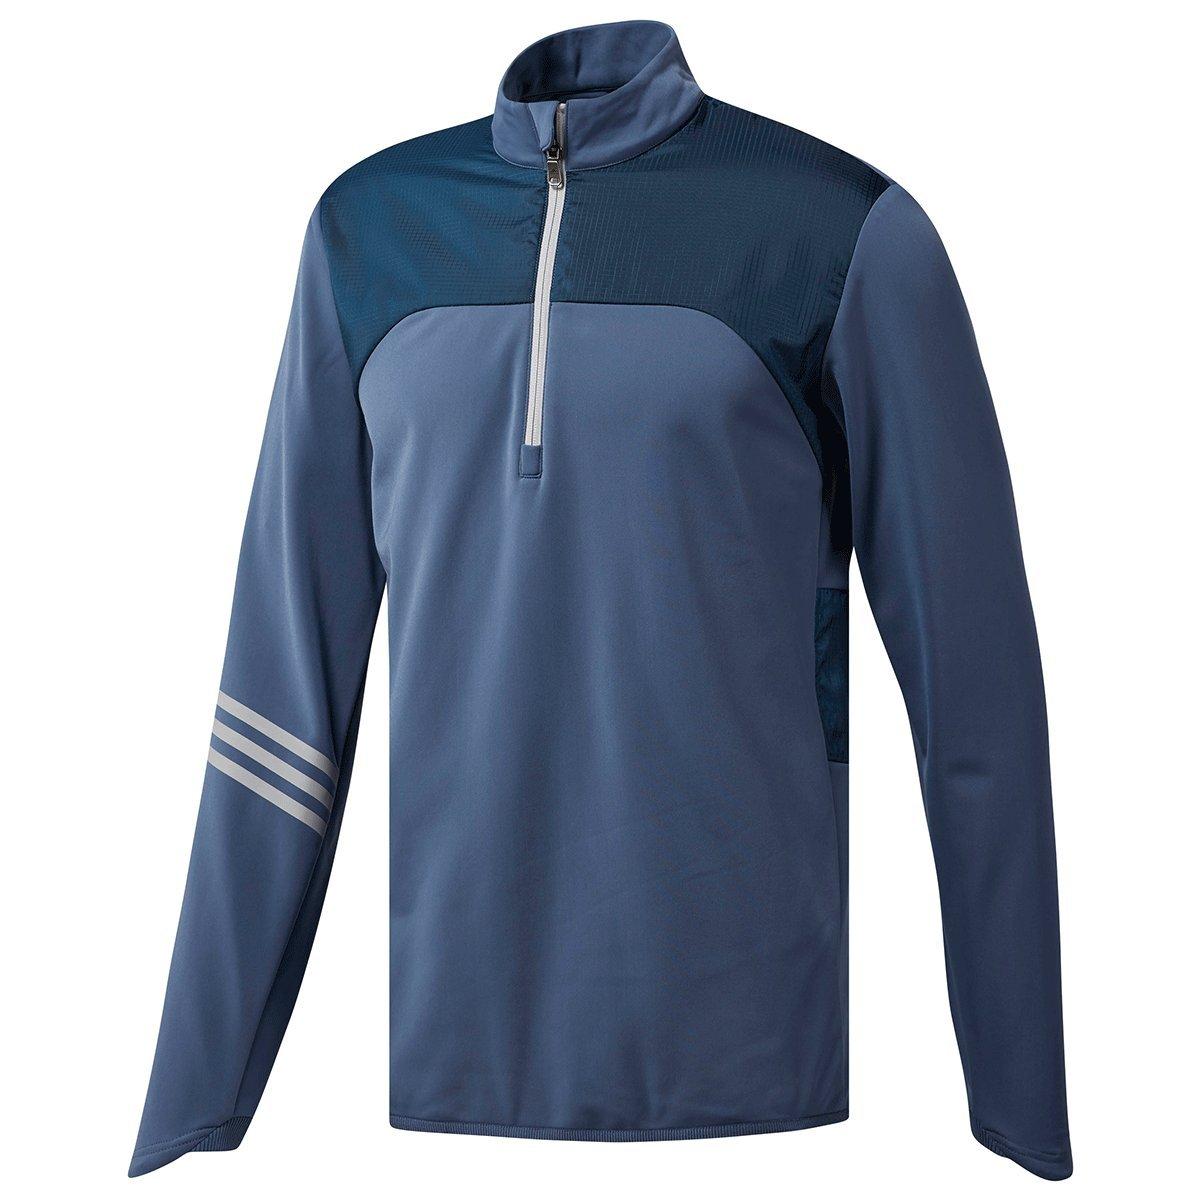 Bleu (bleu Cy7452) XXL adidas Blouson De Sport Homme